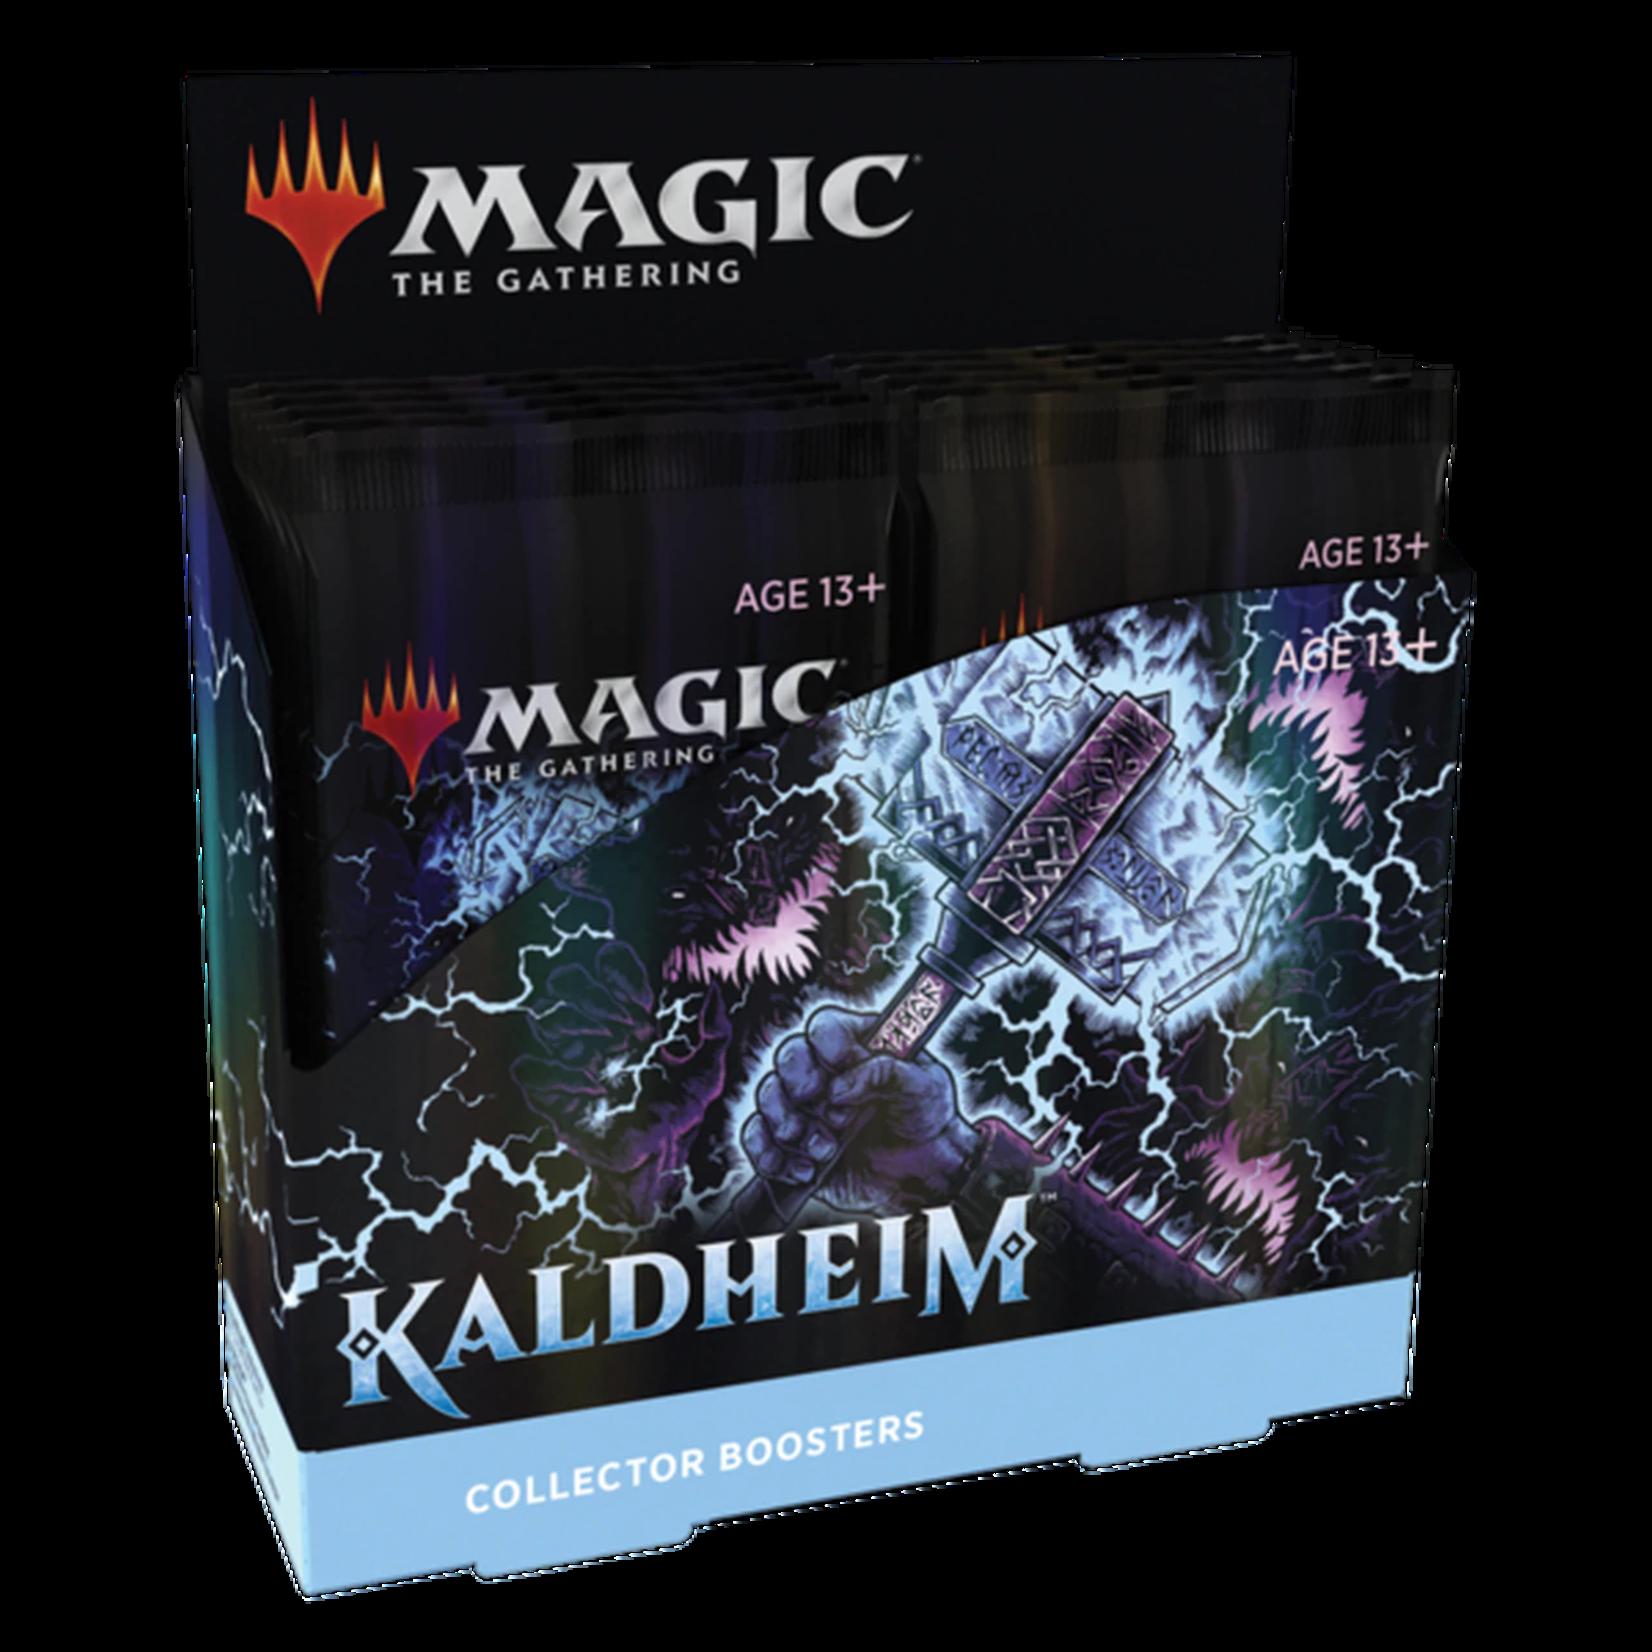 Wizards of the Coast MTG: Kaldheim Collector Bstr (Box)